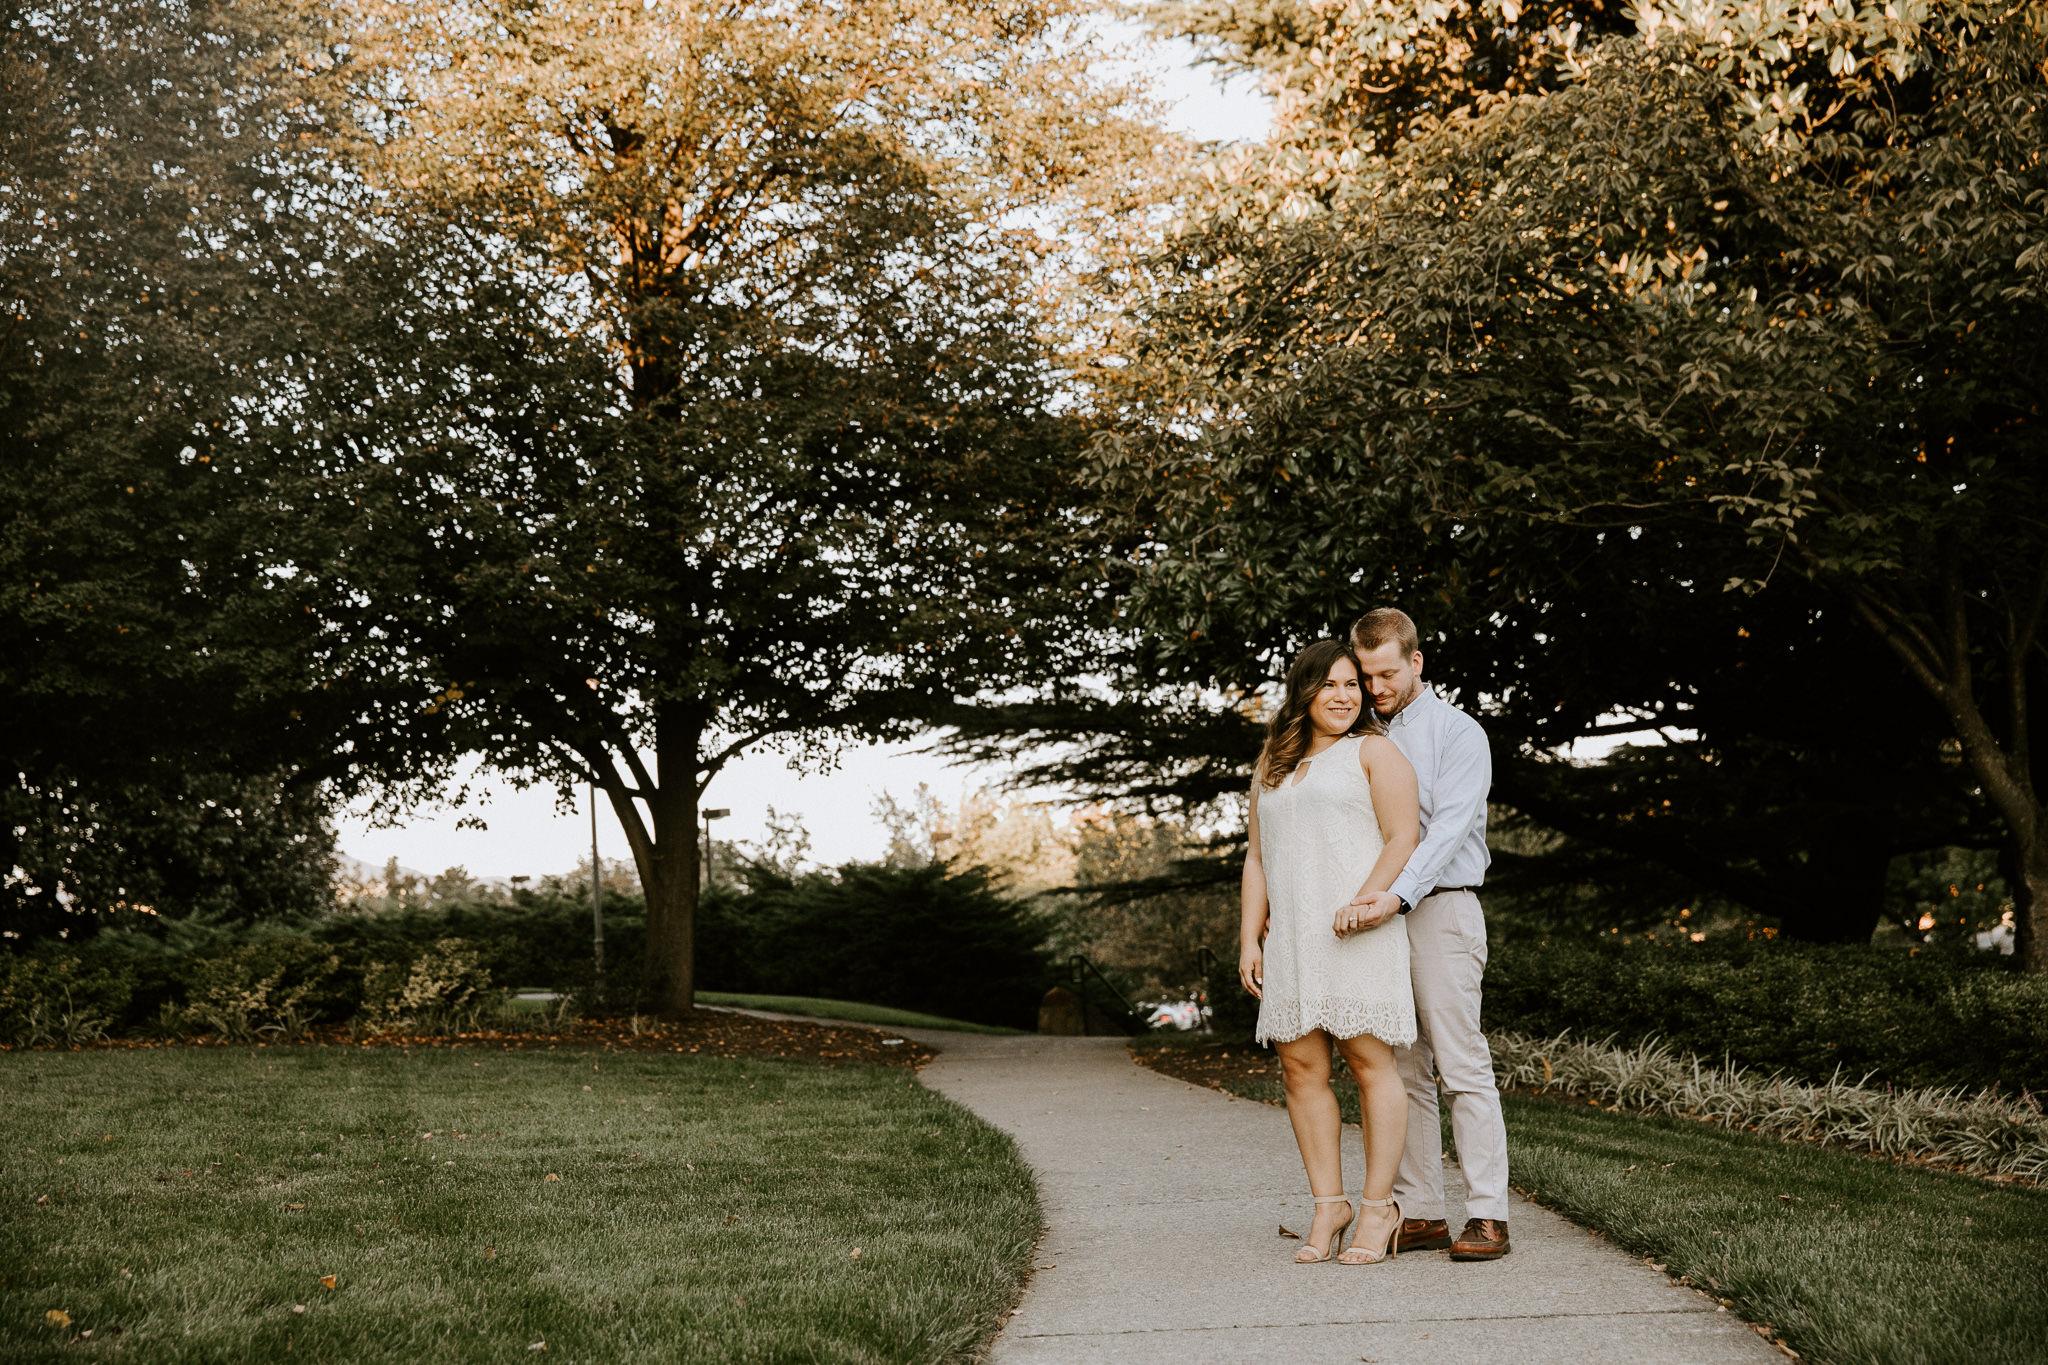 Engagement - Downtown Roanoke -  Wedding Photographer - Virginia - Best - Pat Cori Photography-20.jpg